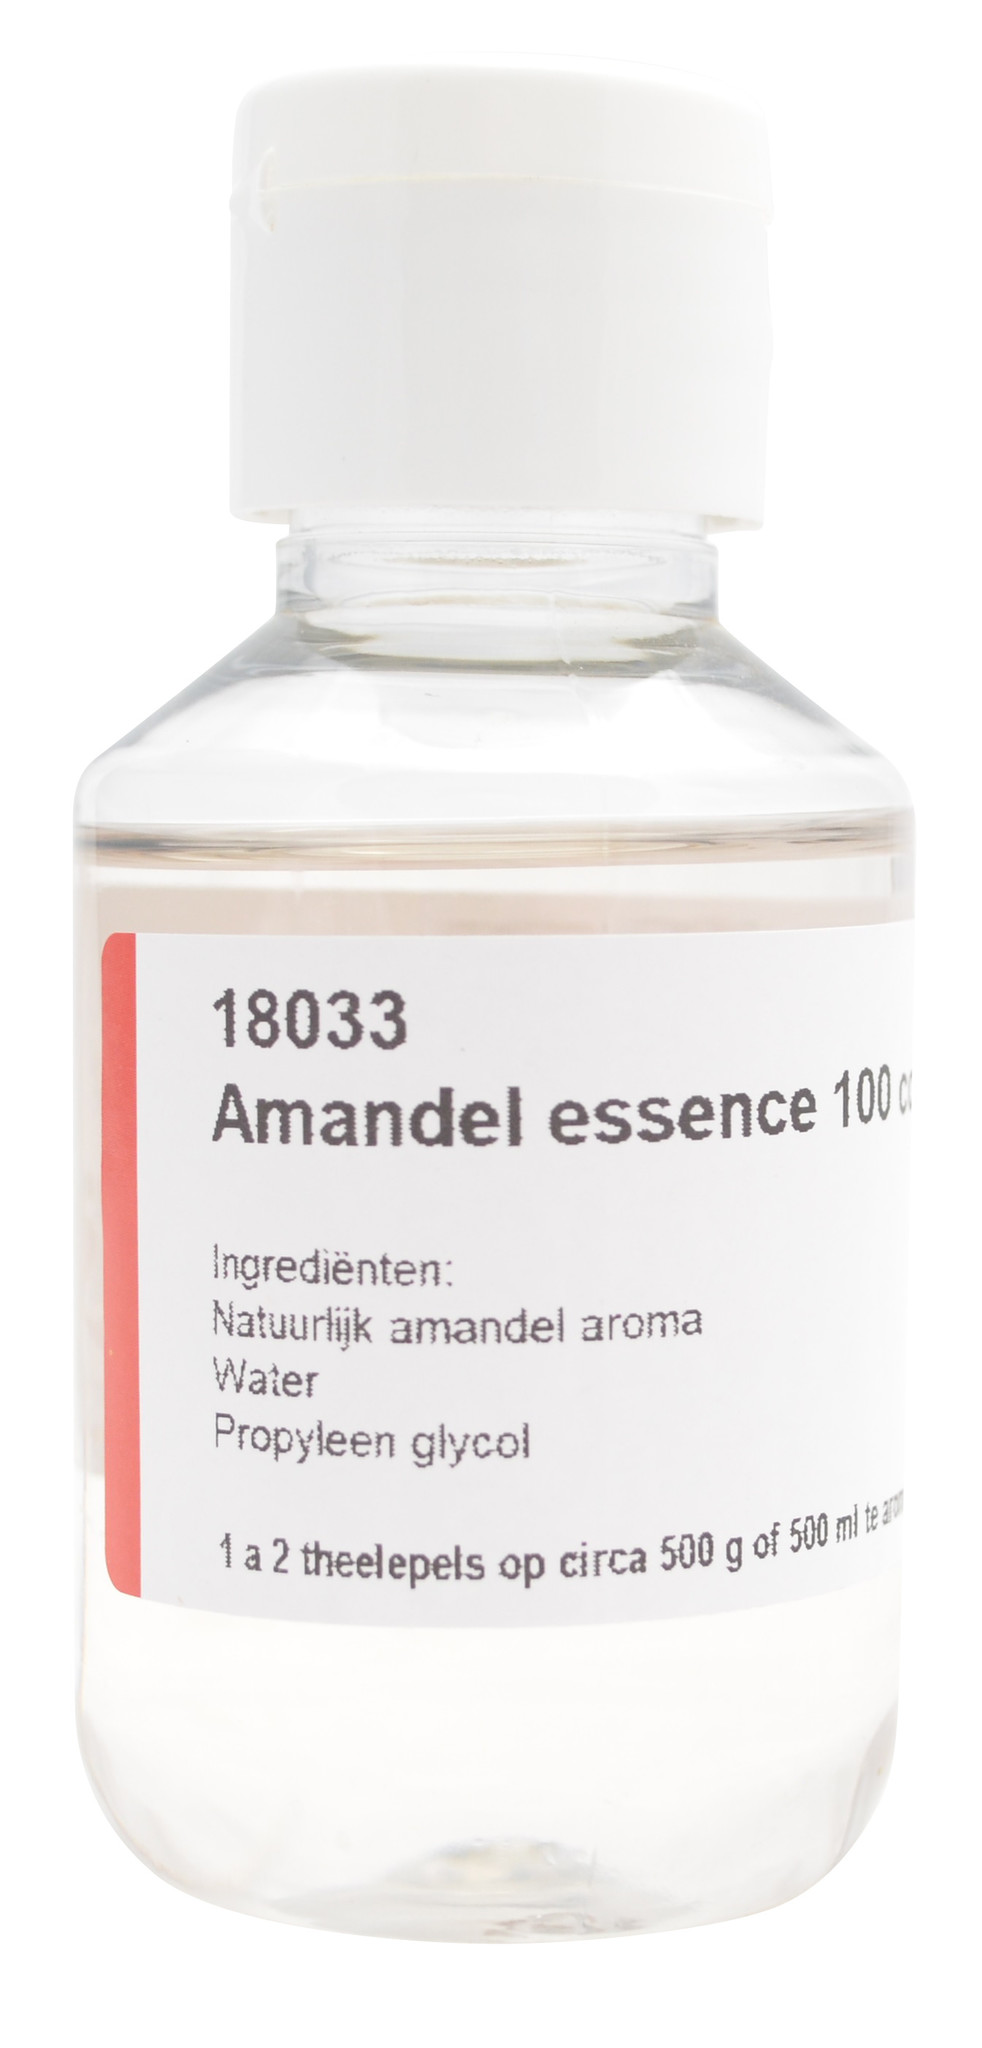 Amandel essence 100 cc